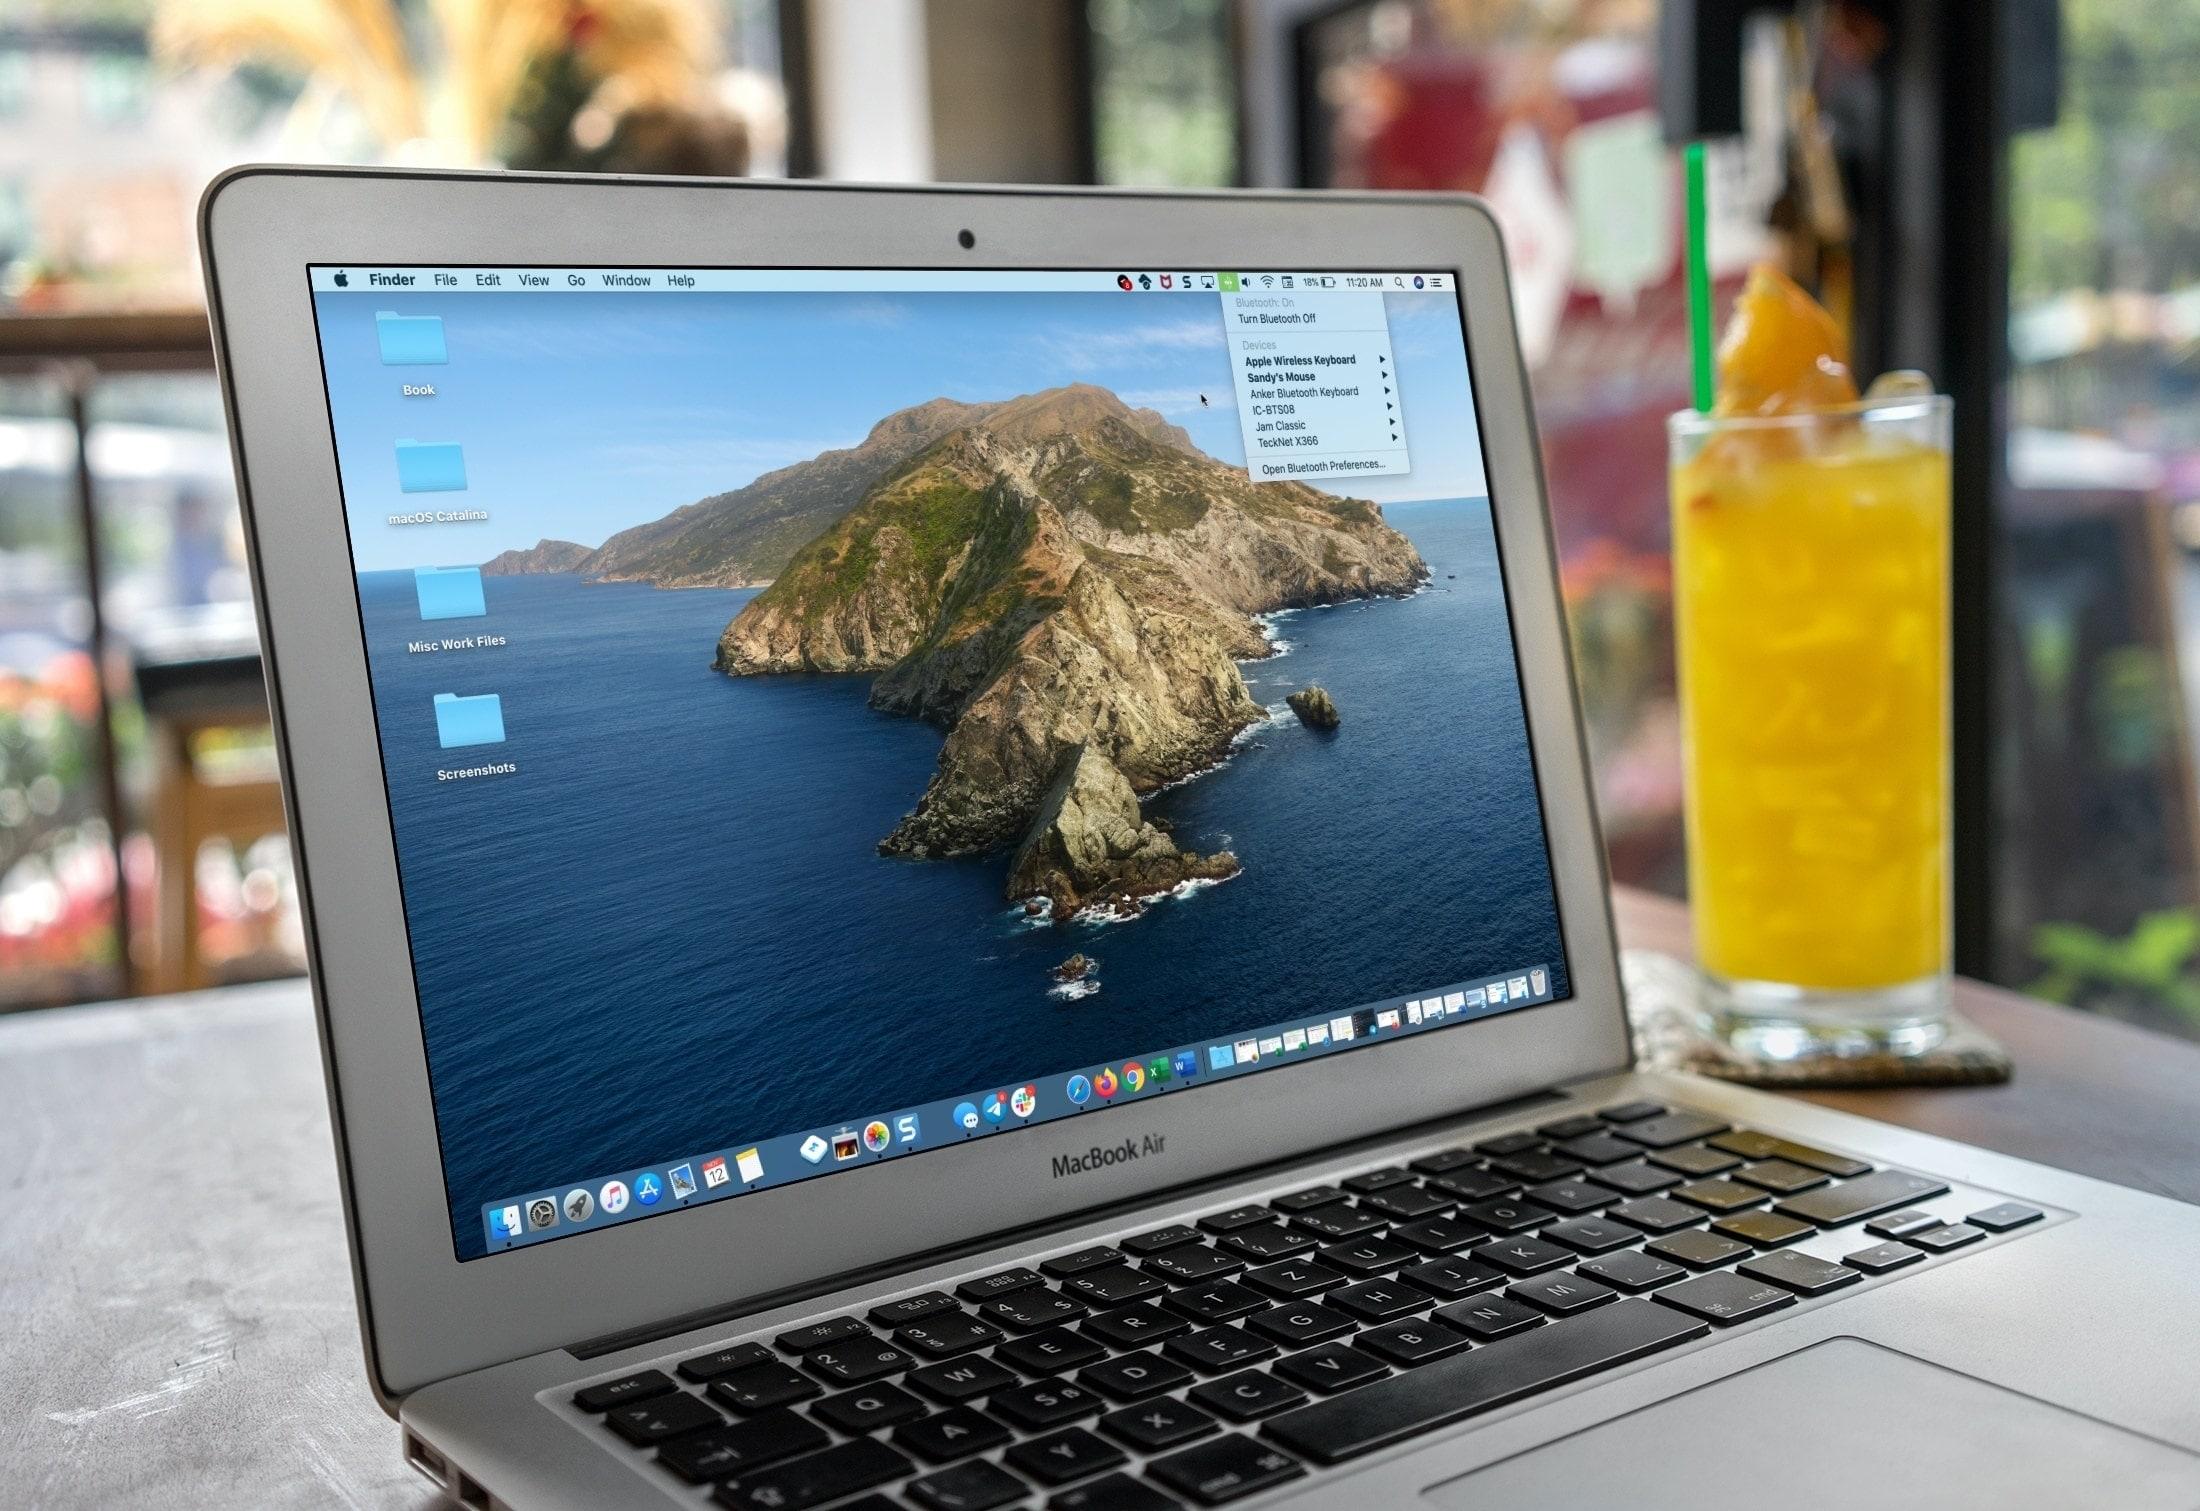 MacBook desktop - learn the menu bar